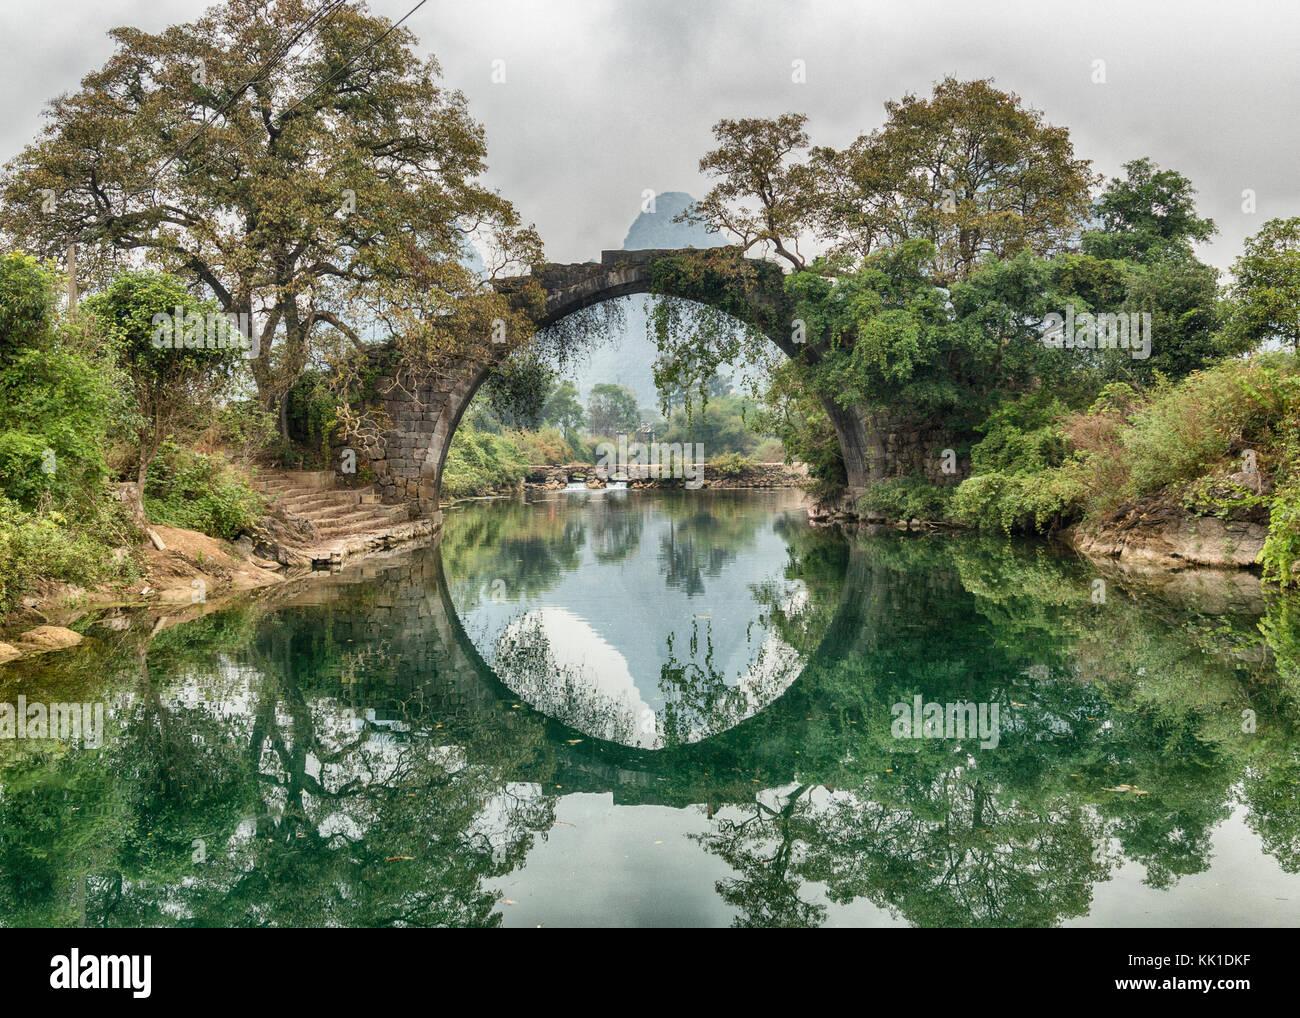 Fuli Bridge on the Yulong River Yangshuo China - Stock Image